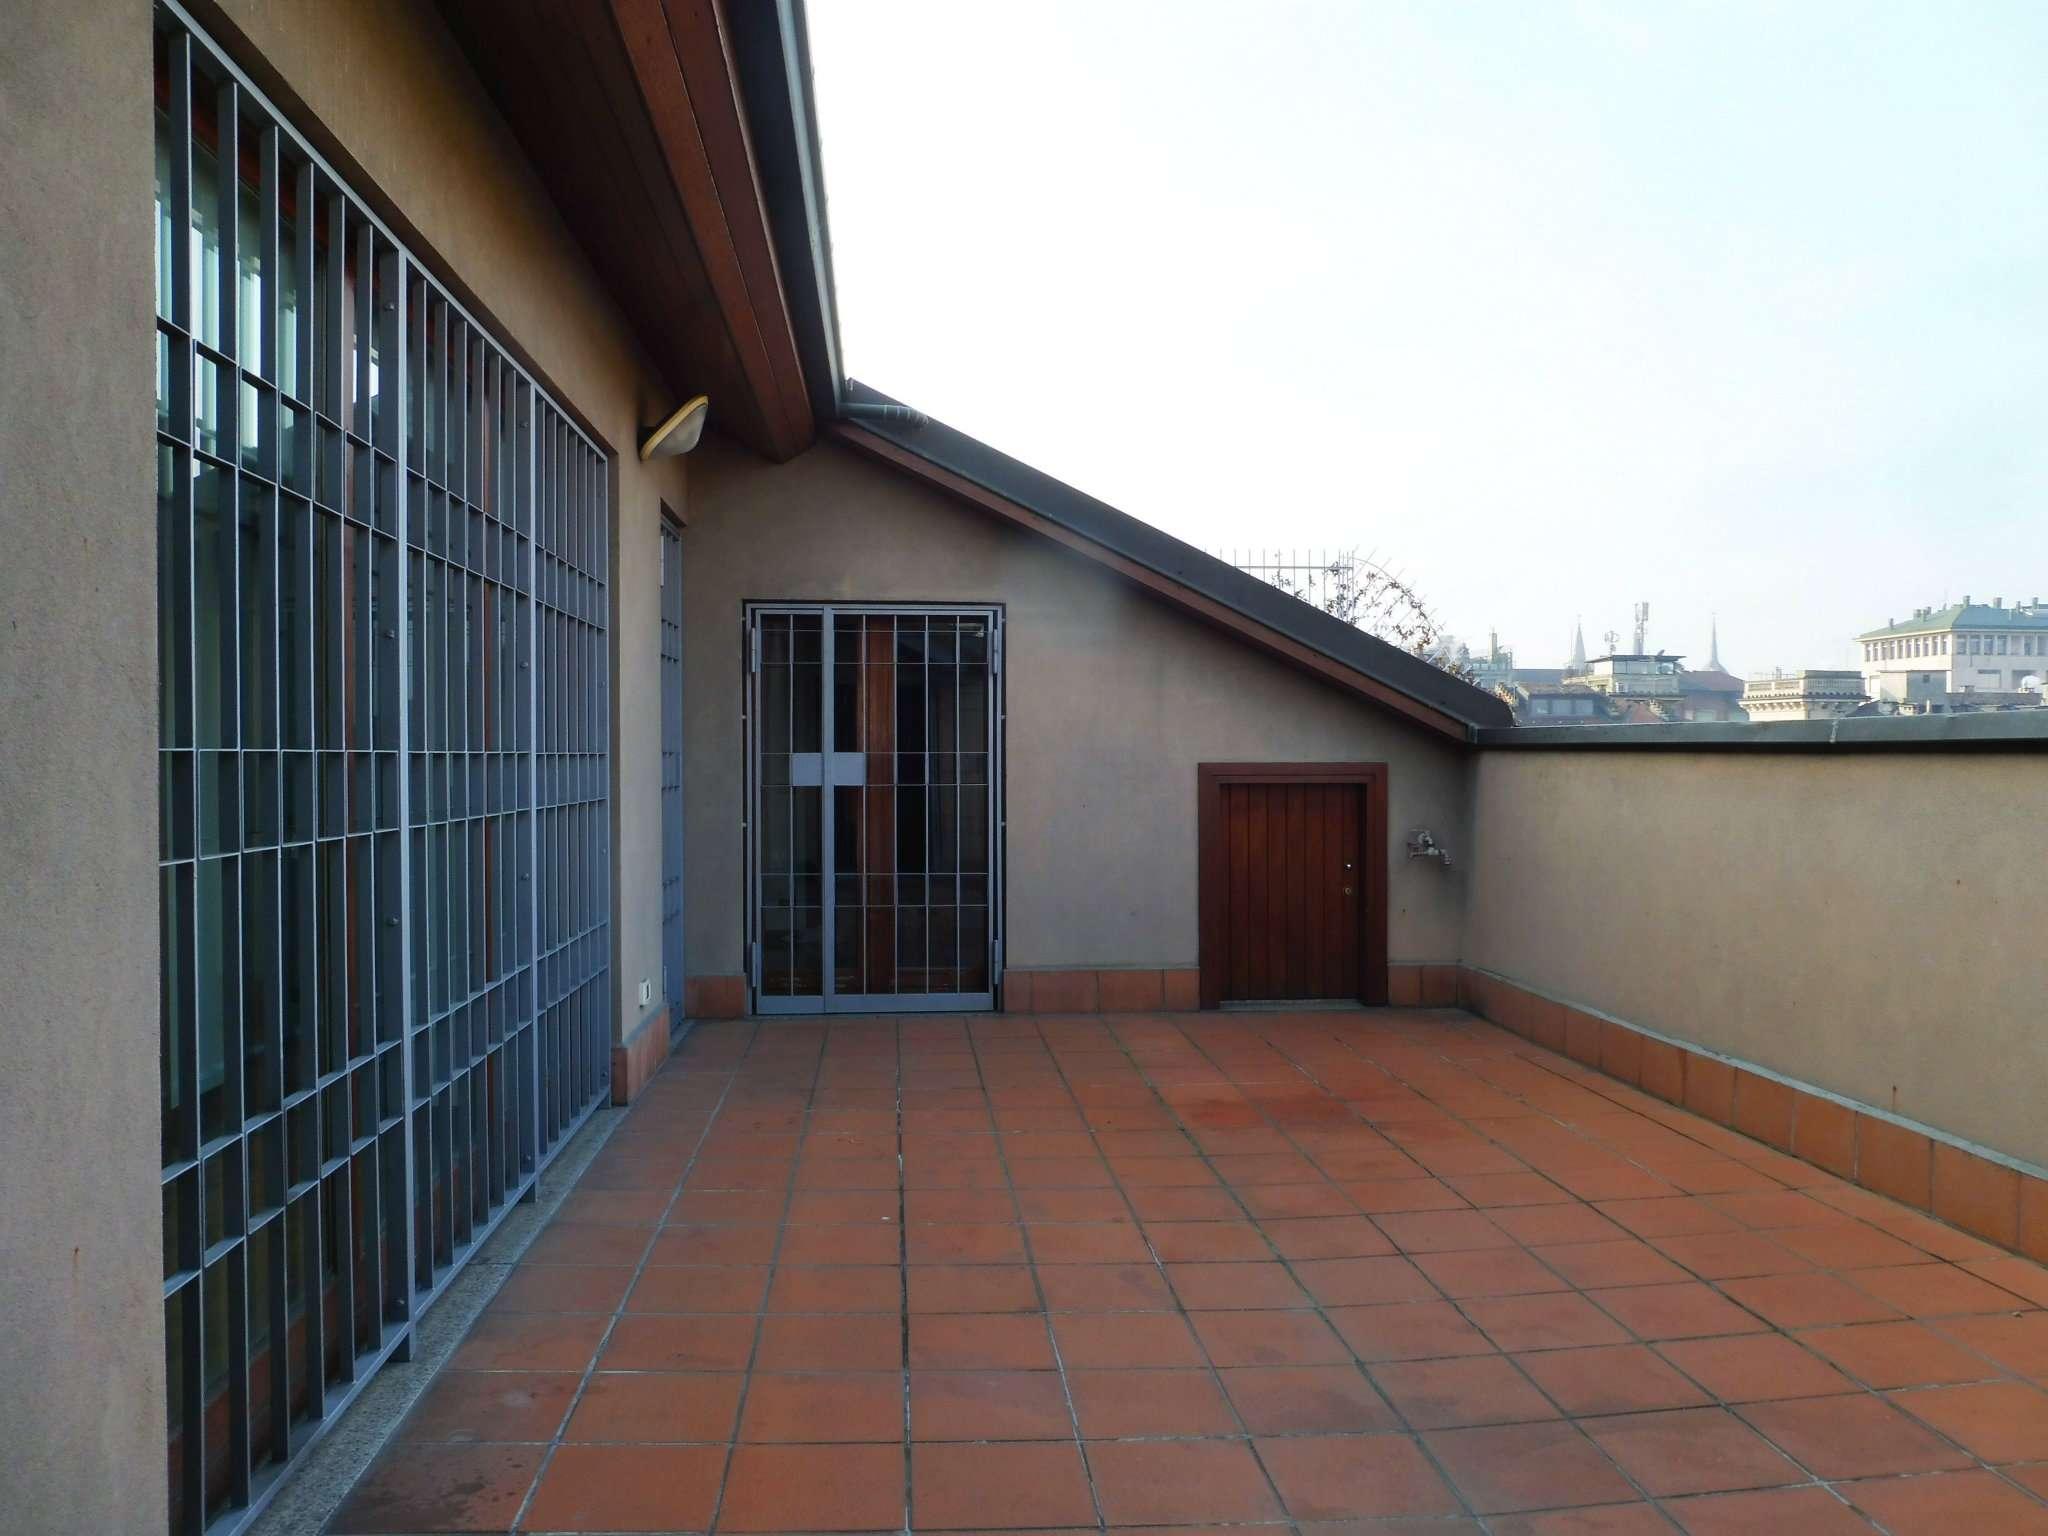 Foto 1 di Attico / Mansarda via Madama Cristina, Torino (zona San Salvario)